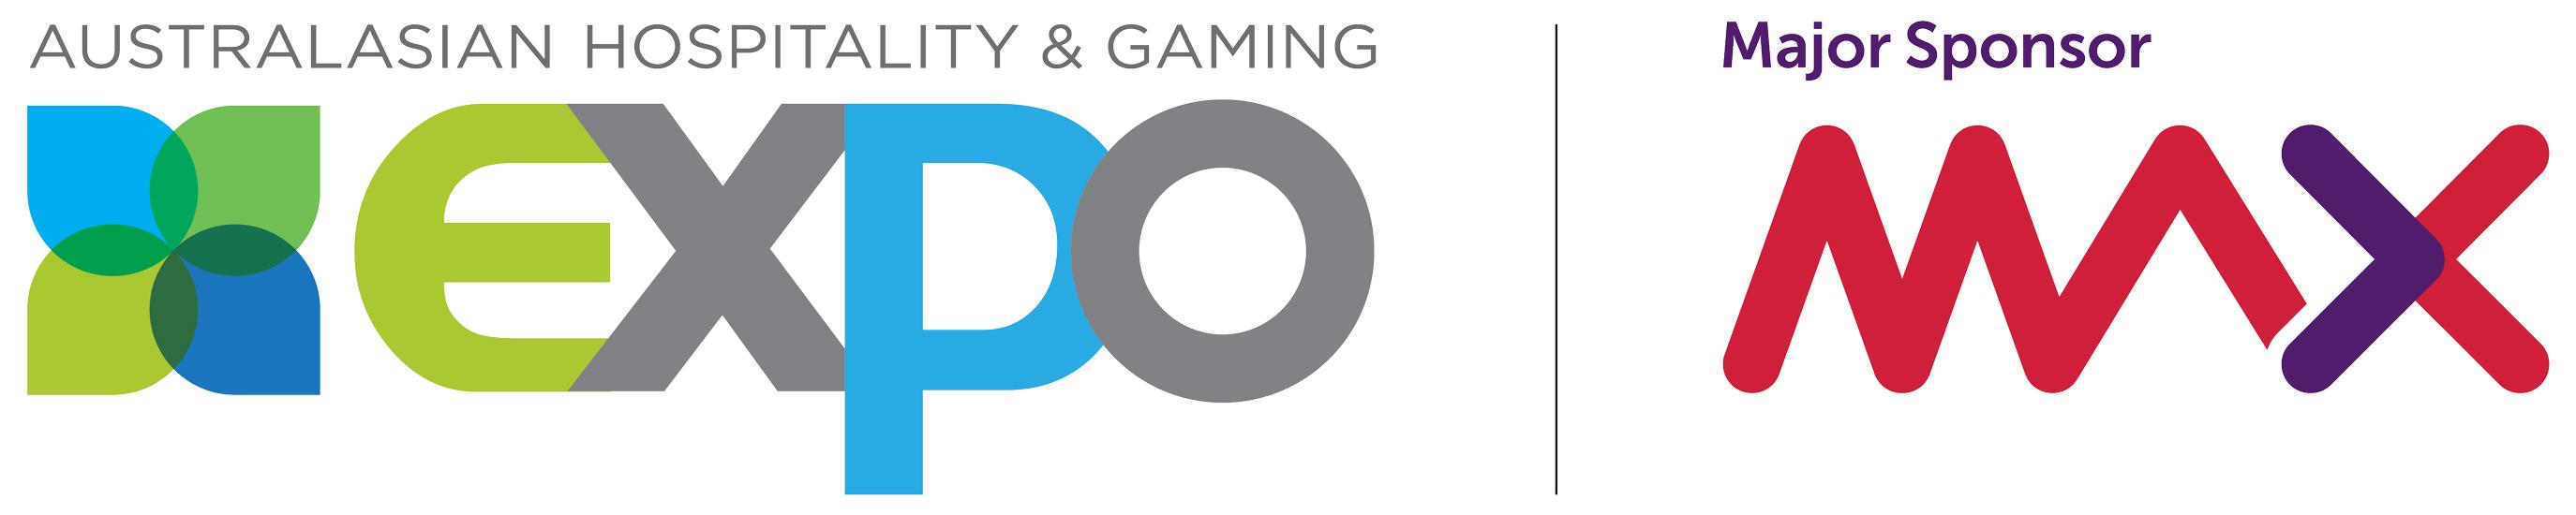 Australasian Hospitality and Gaming Expo